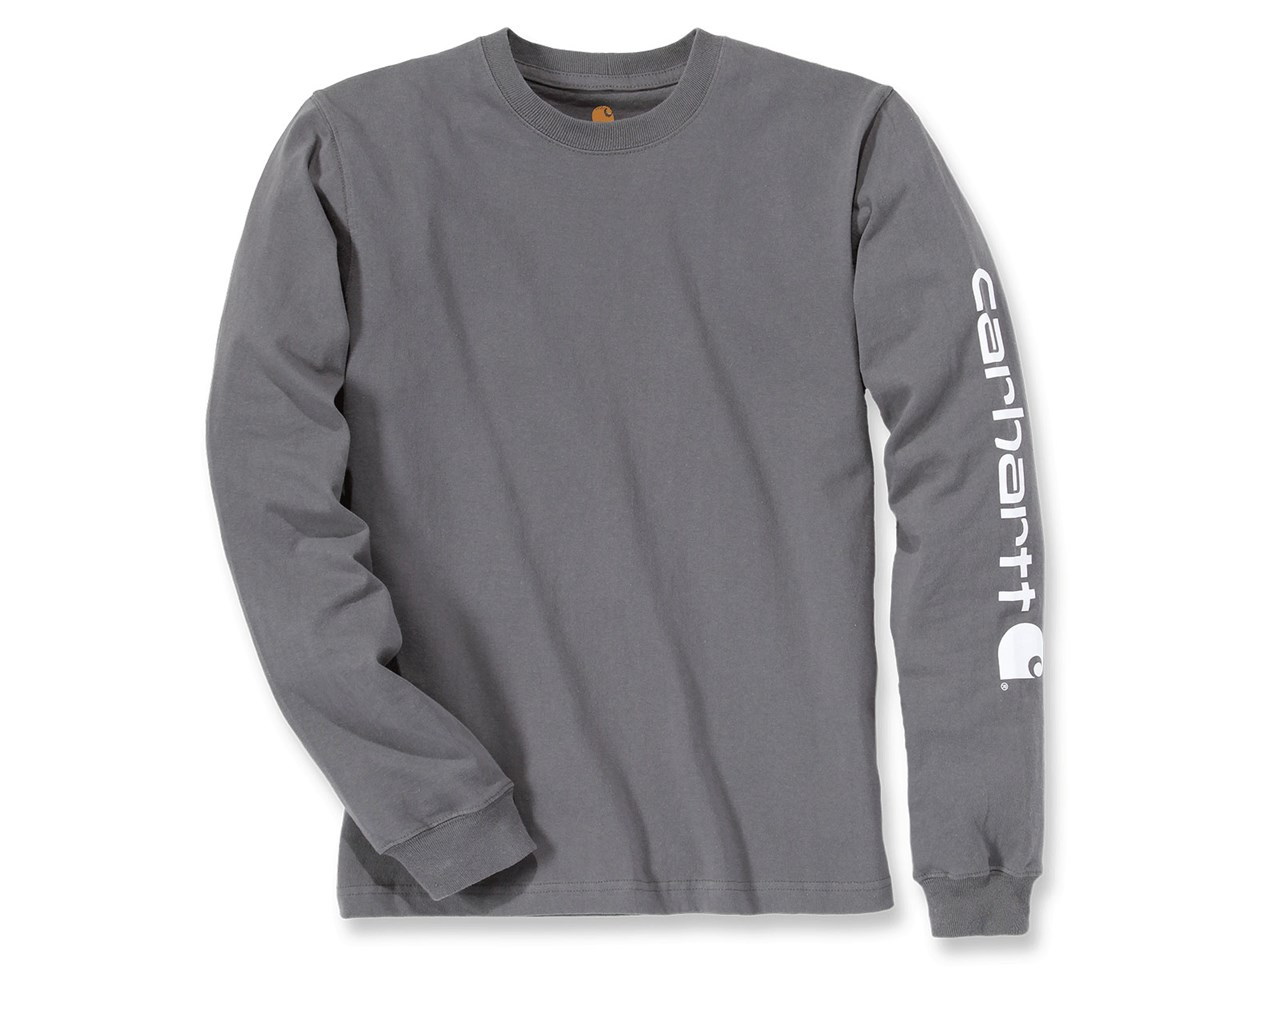 charcoal-carhartt-long-sleeve-logo-tshirt-w1280h1024q90i15007